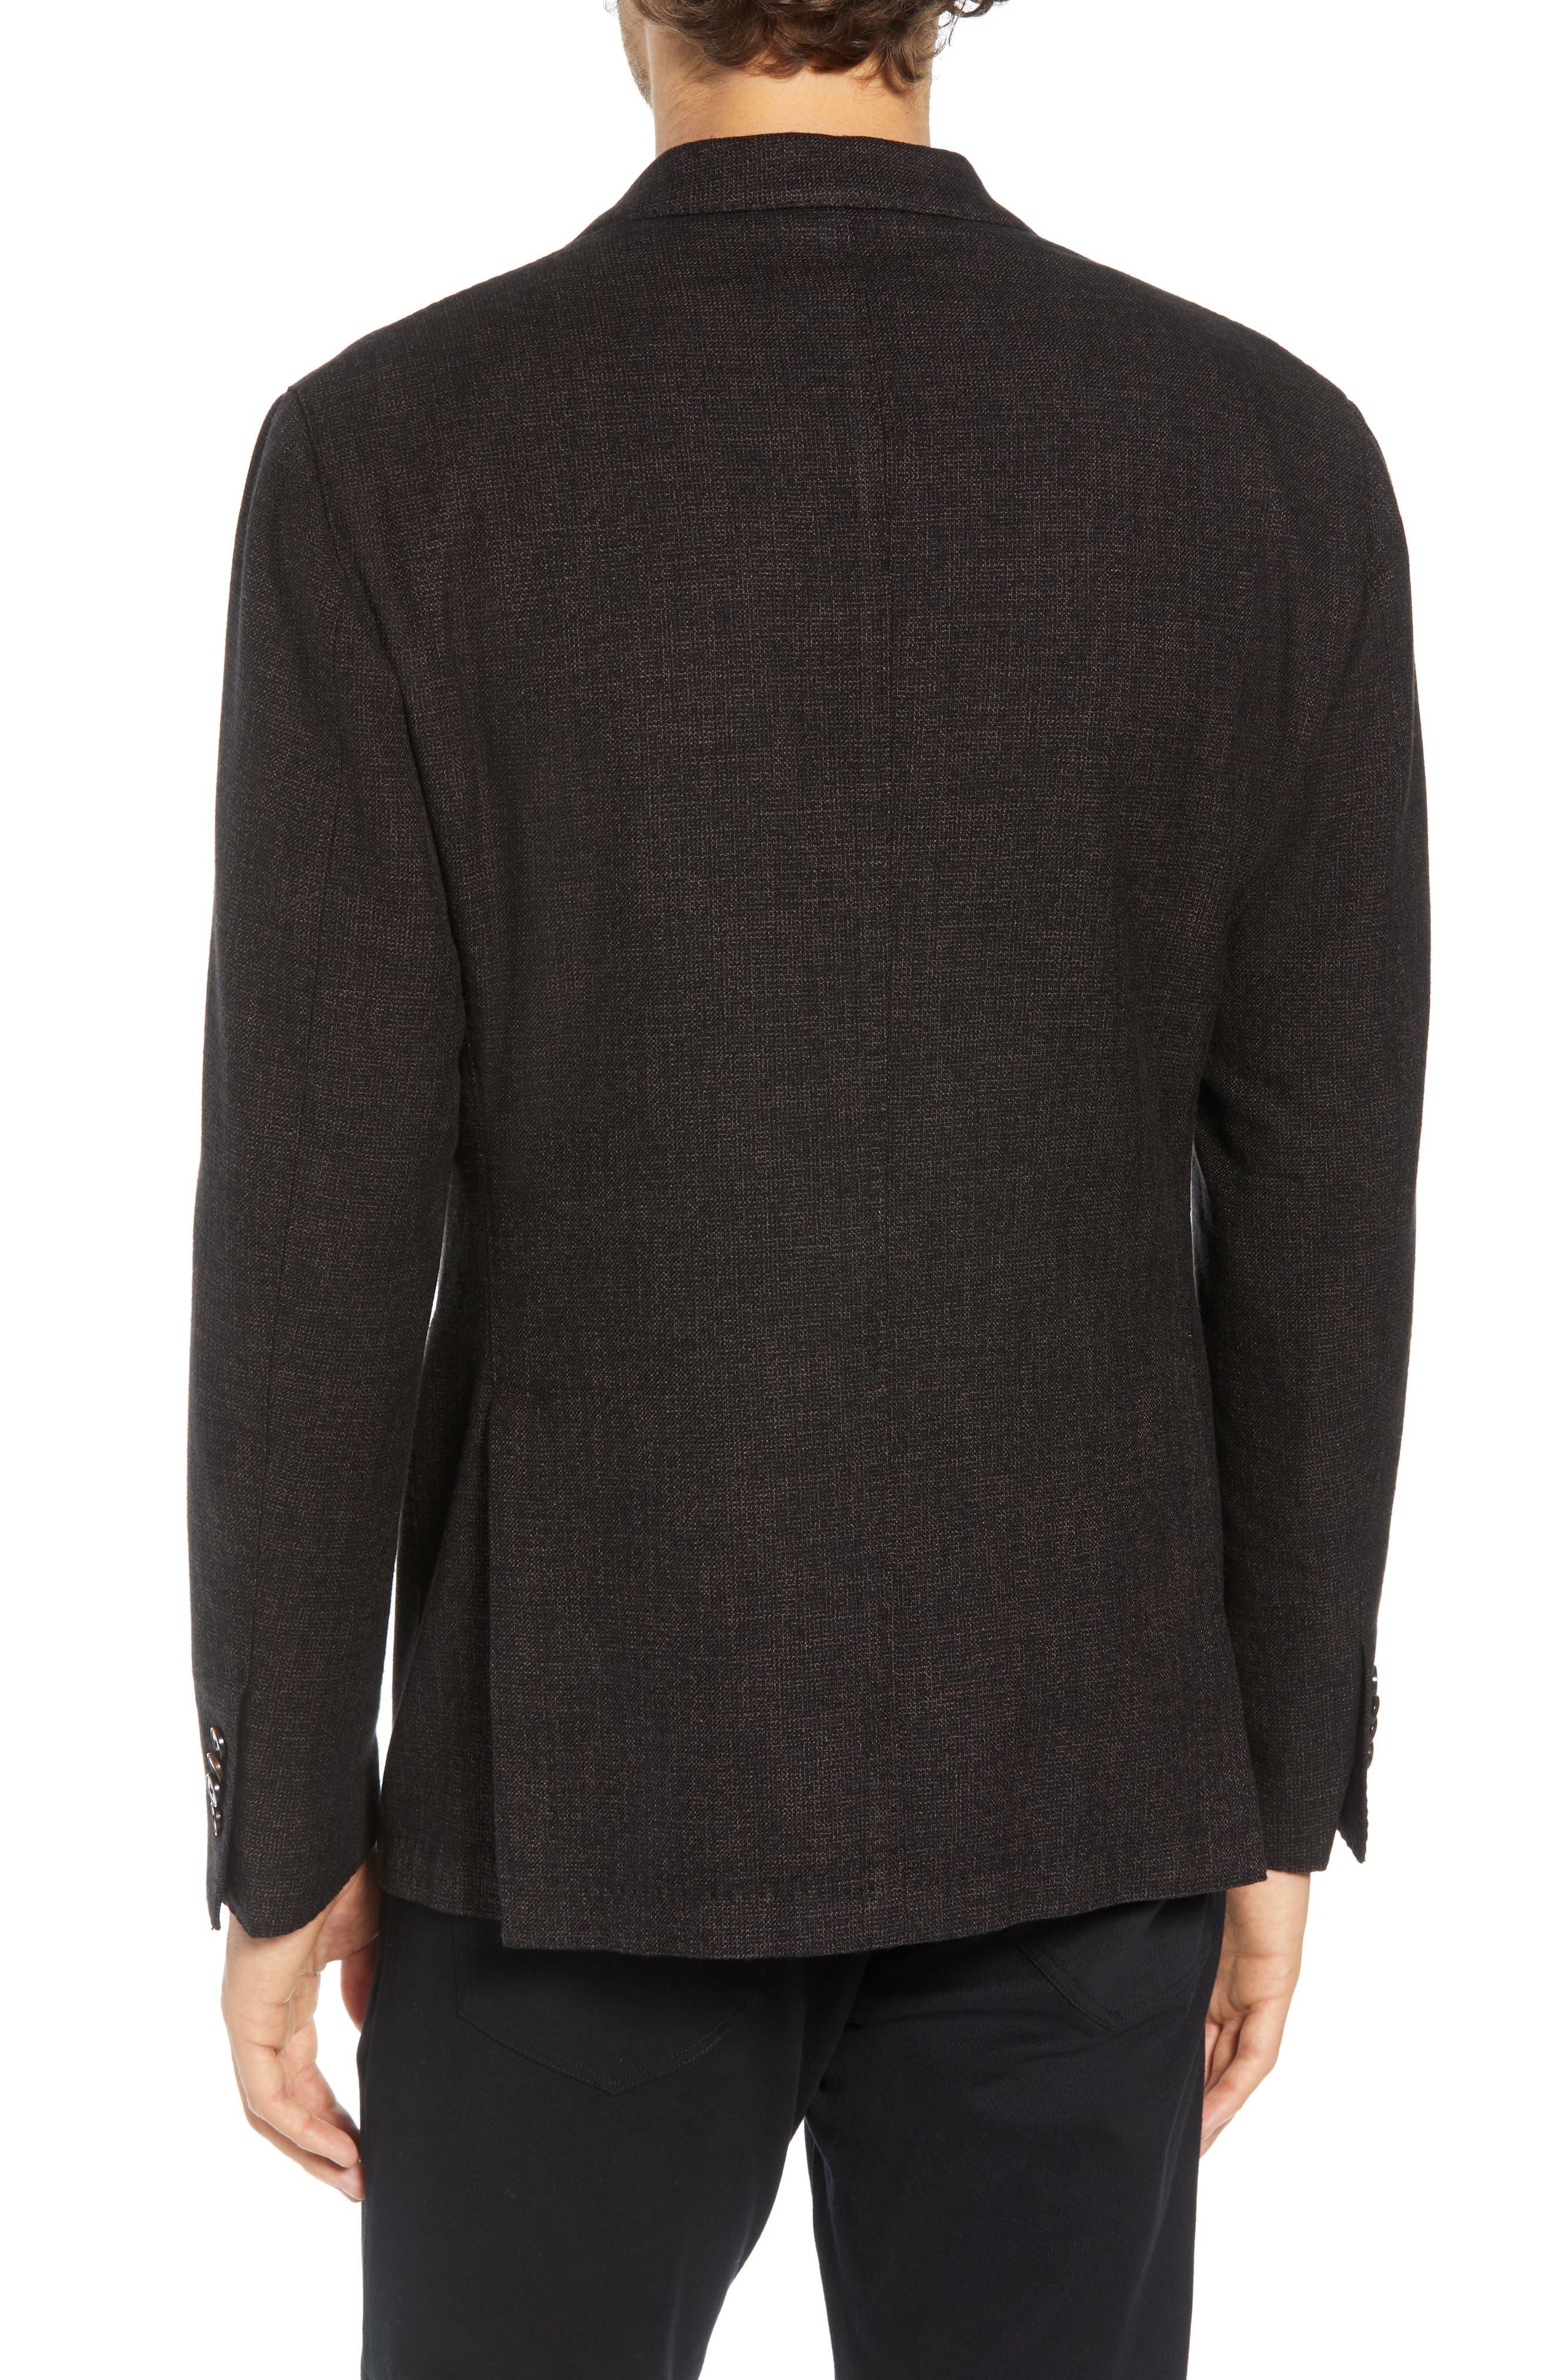 L.B.M 1911 Classic Fit Cotton & Wool Blazer,                             Alternate thumbnail 2, color,                             BROWN